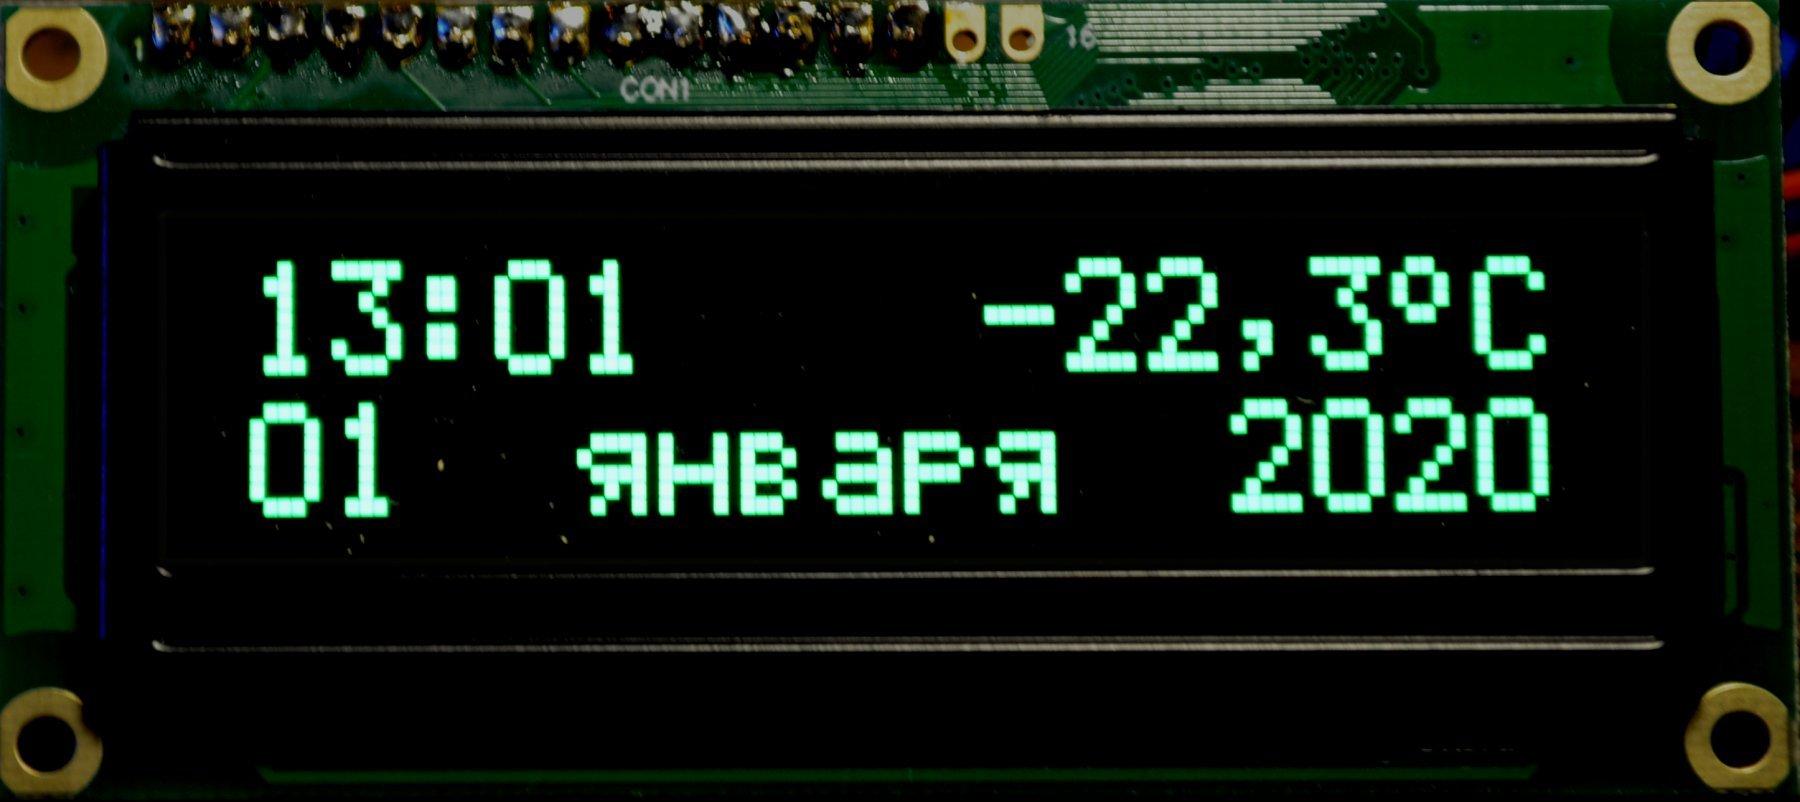 Управление LCD и OLED дисплеями на AVR-ассемблере - 2